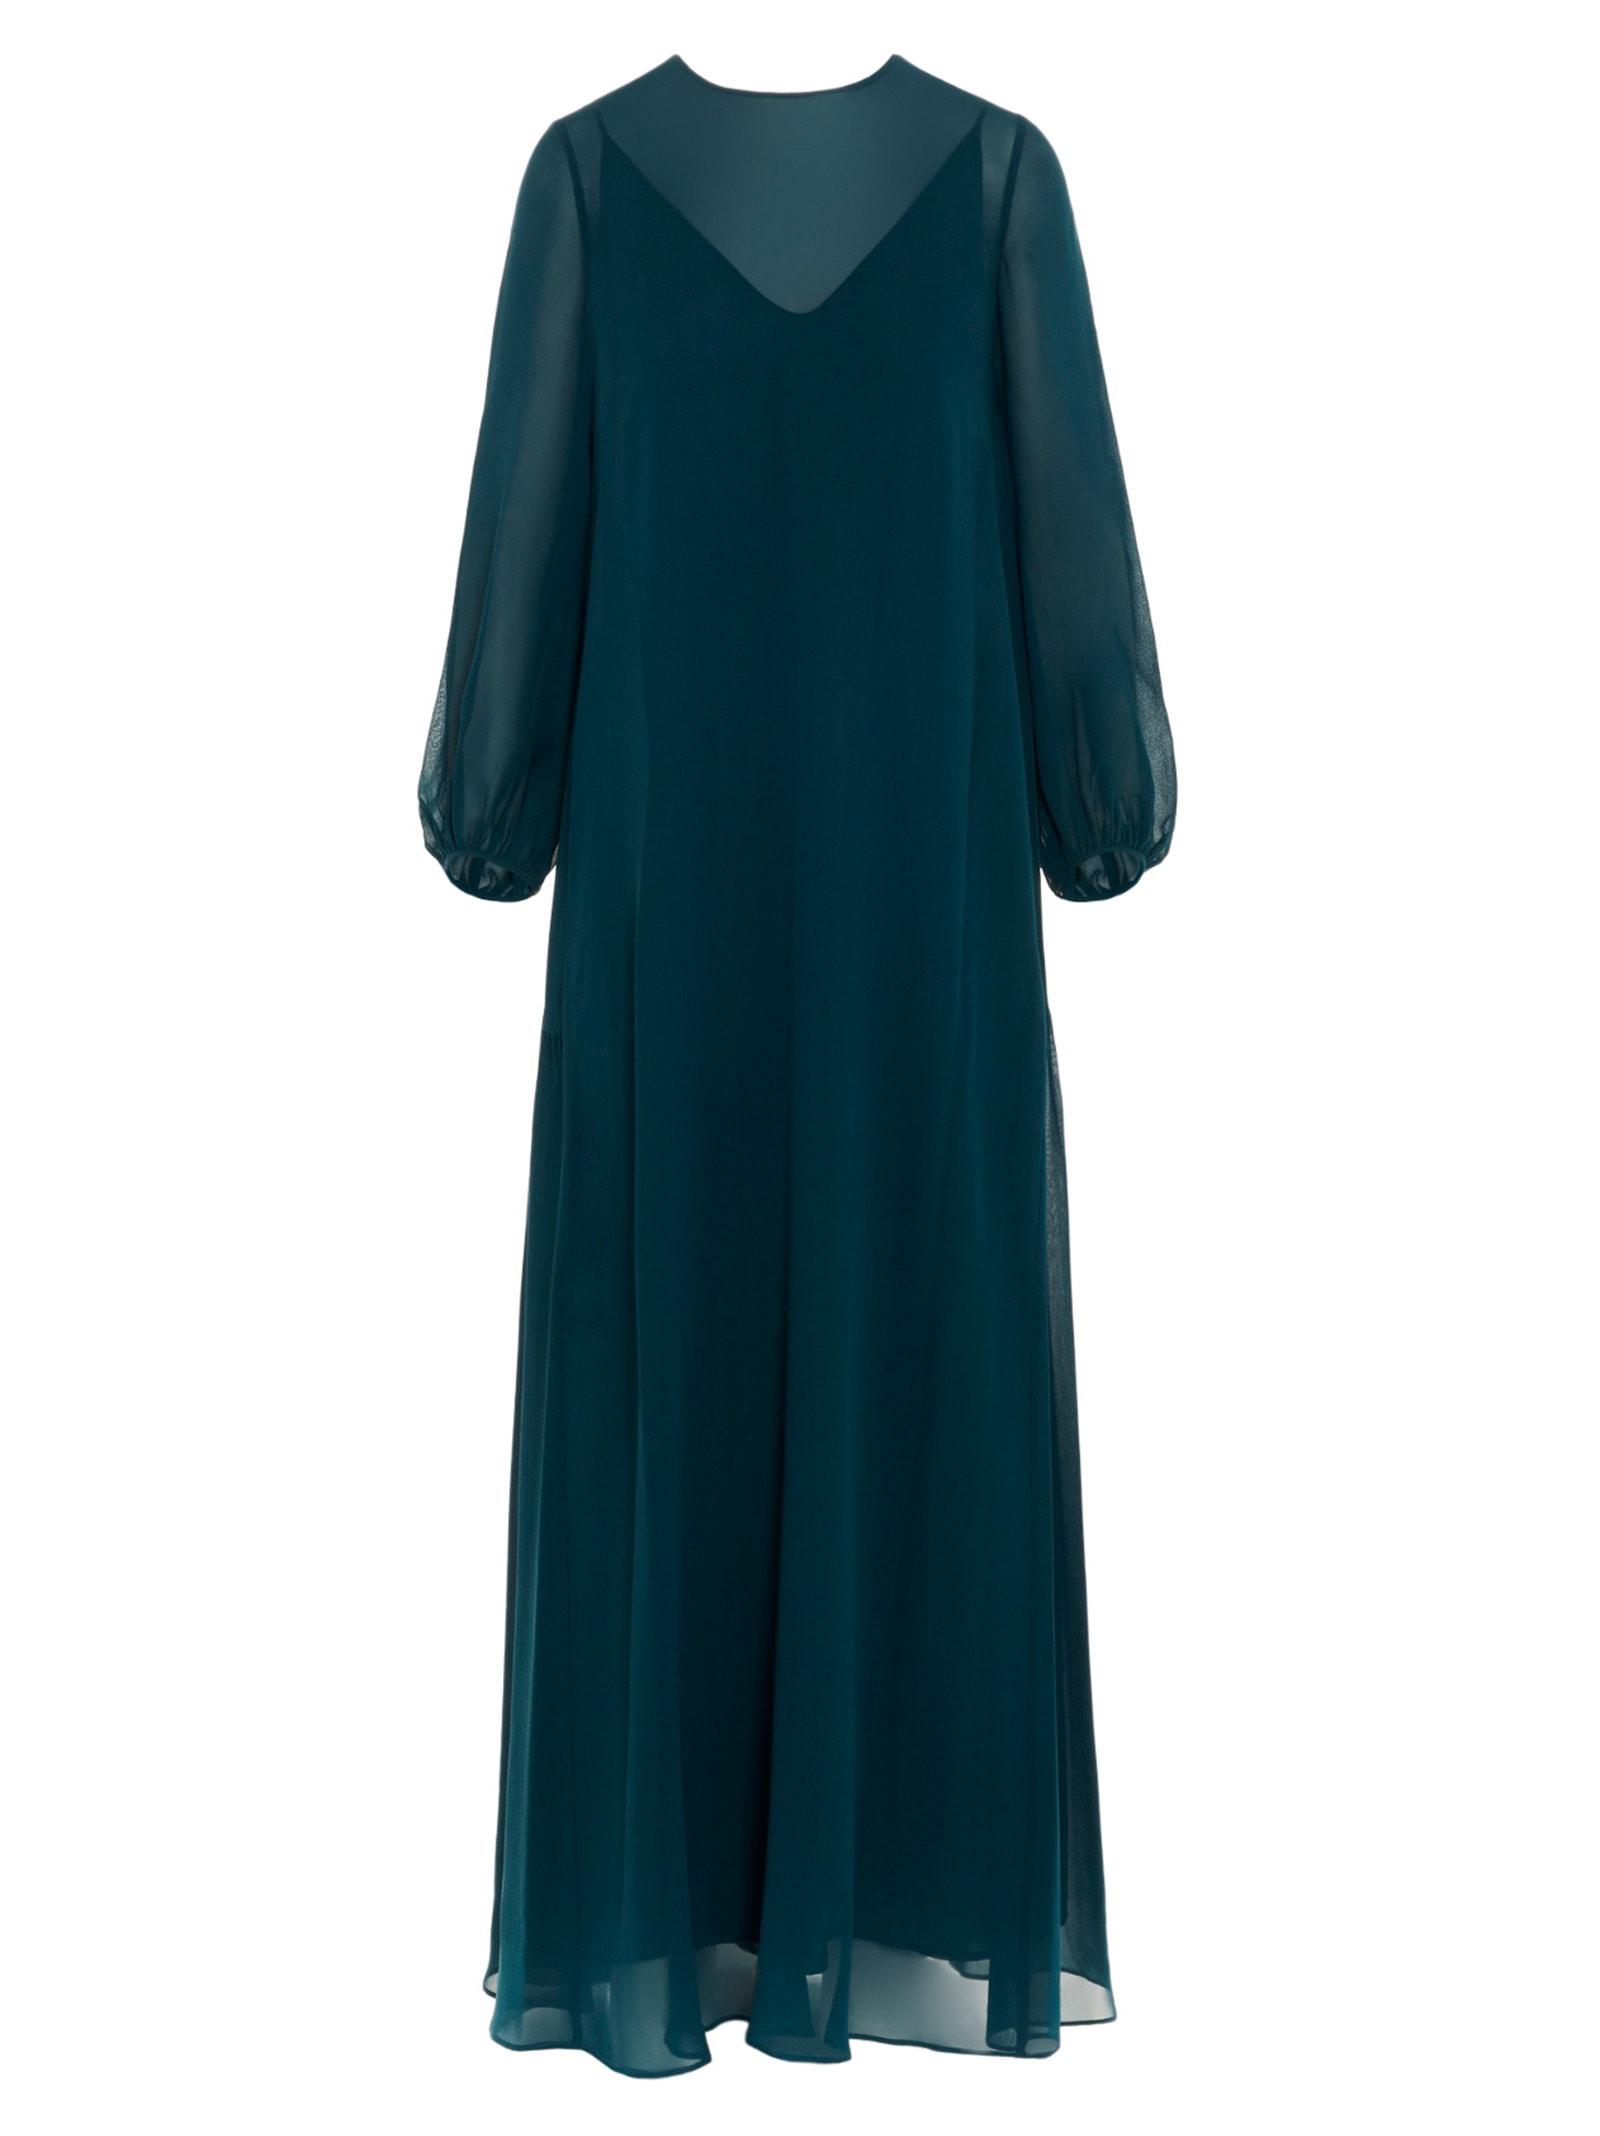 clipper Dress